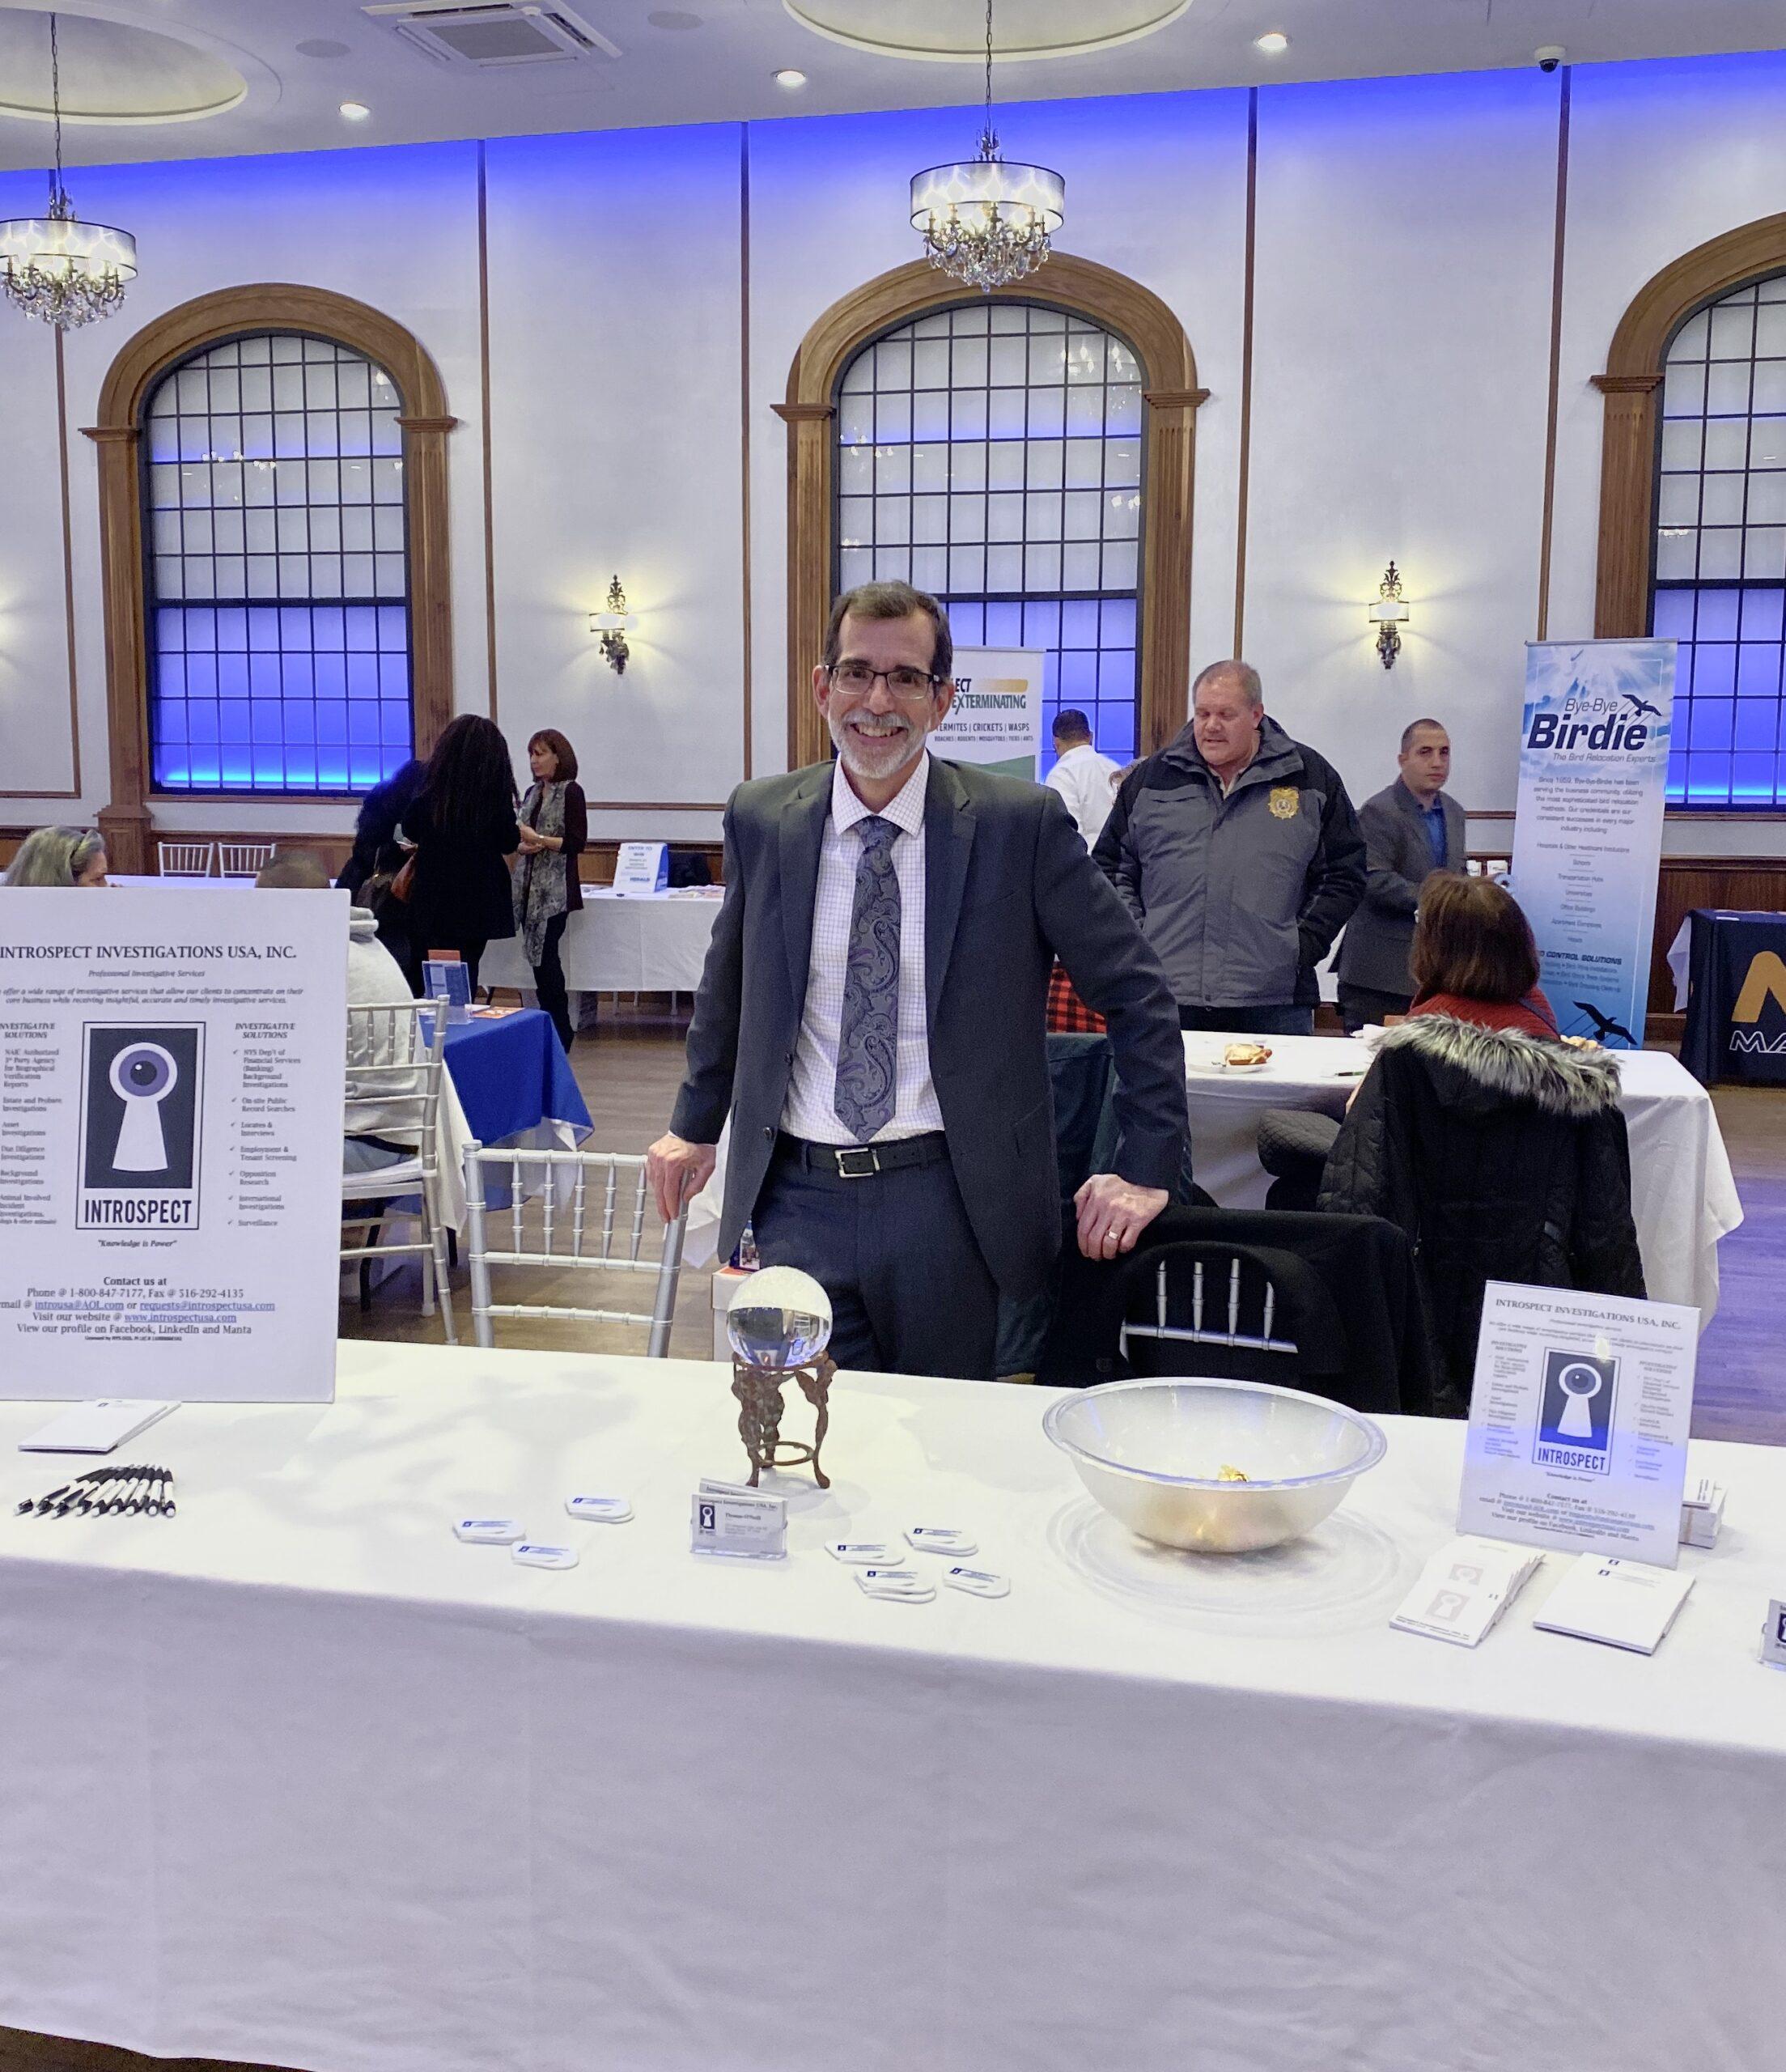 Tom Oneill FSCC Business Expo November 2019